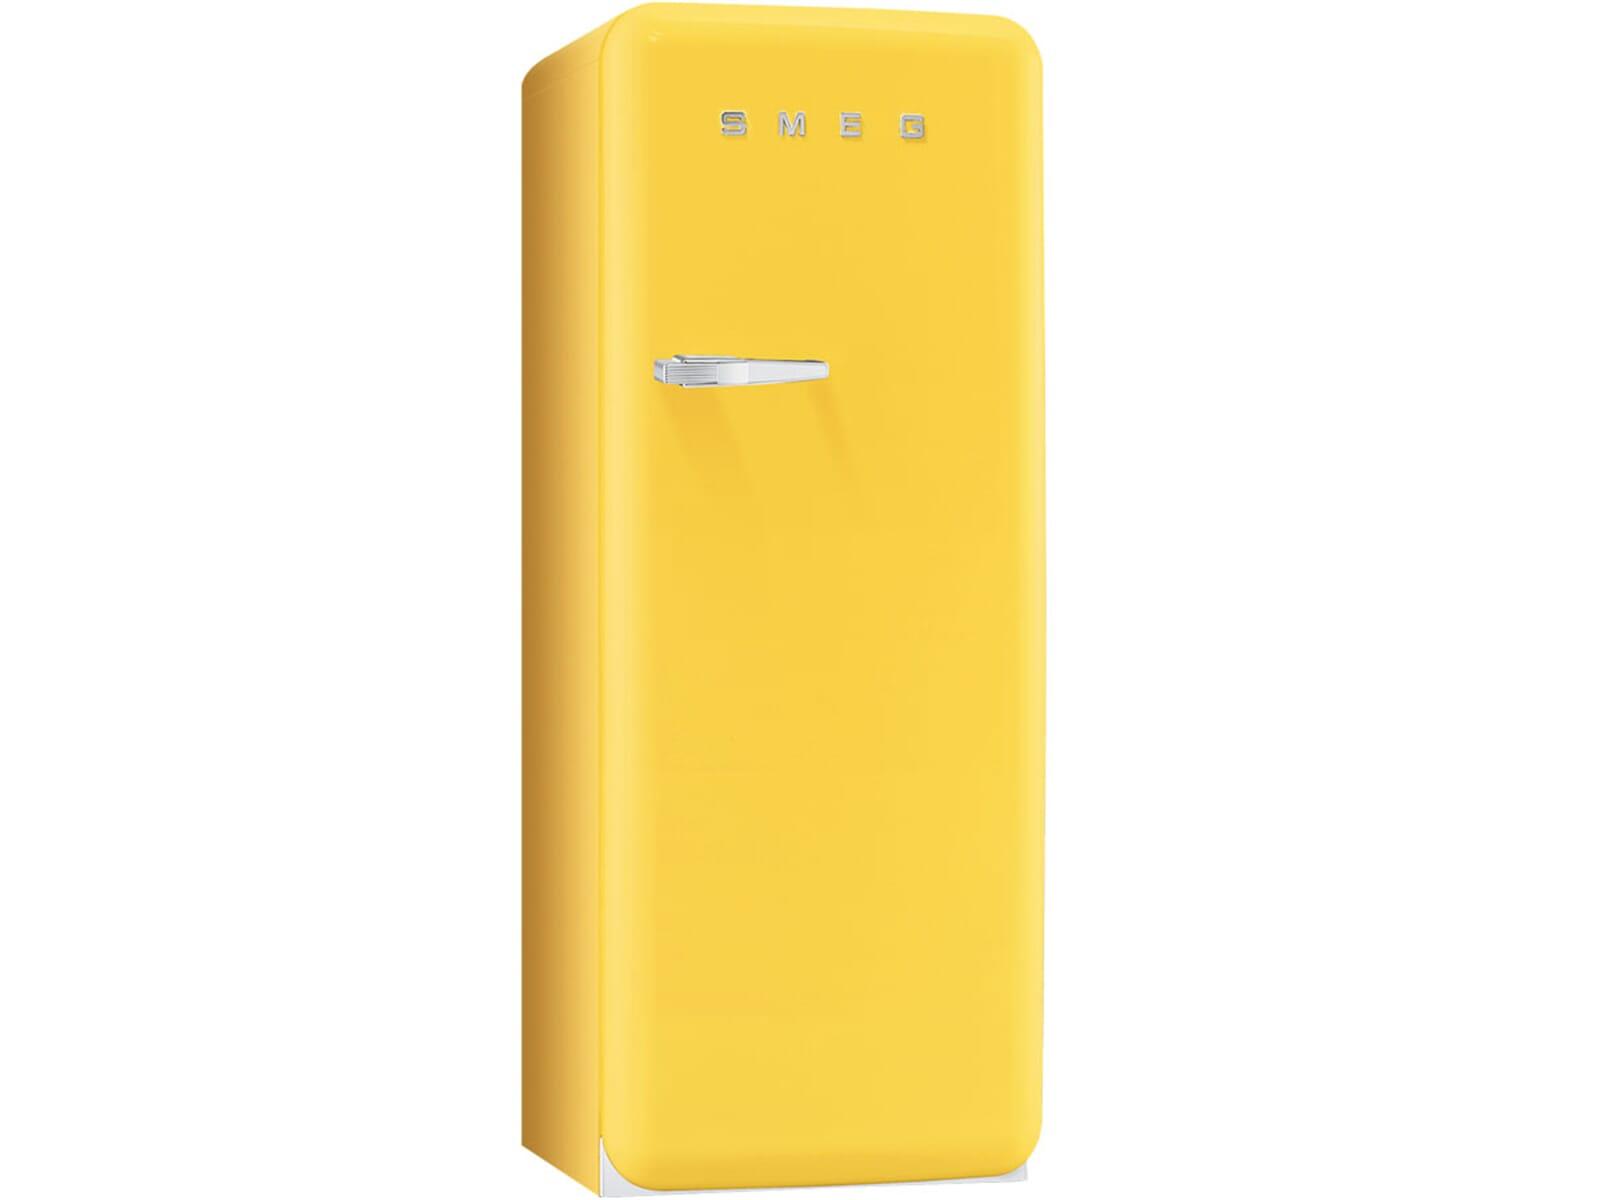 Smeg Kühlschrank Erfahrungen : Ikea küchengeräte test backöfen jcooler